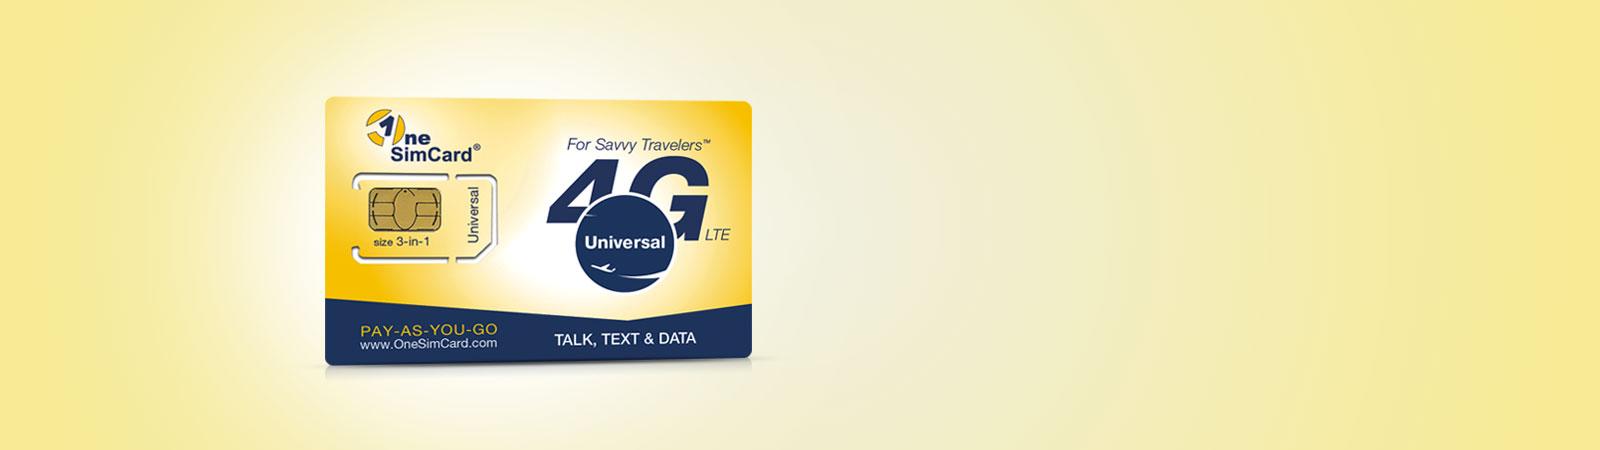 Internationale Sim Karte.International Sim Card Prepaid Roaming Sim From Onesimcard